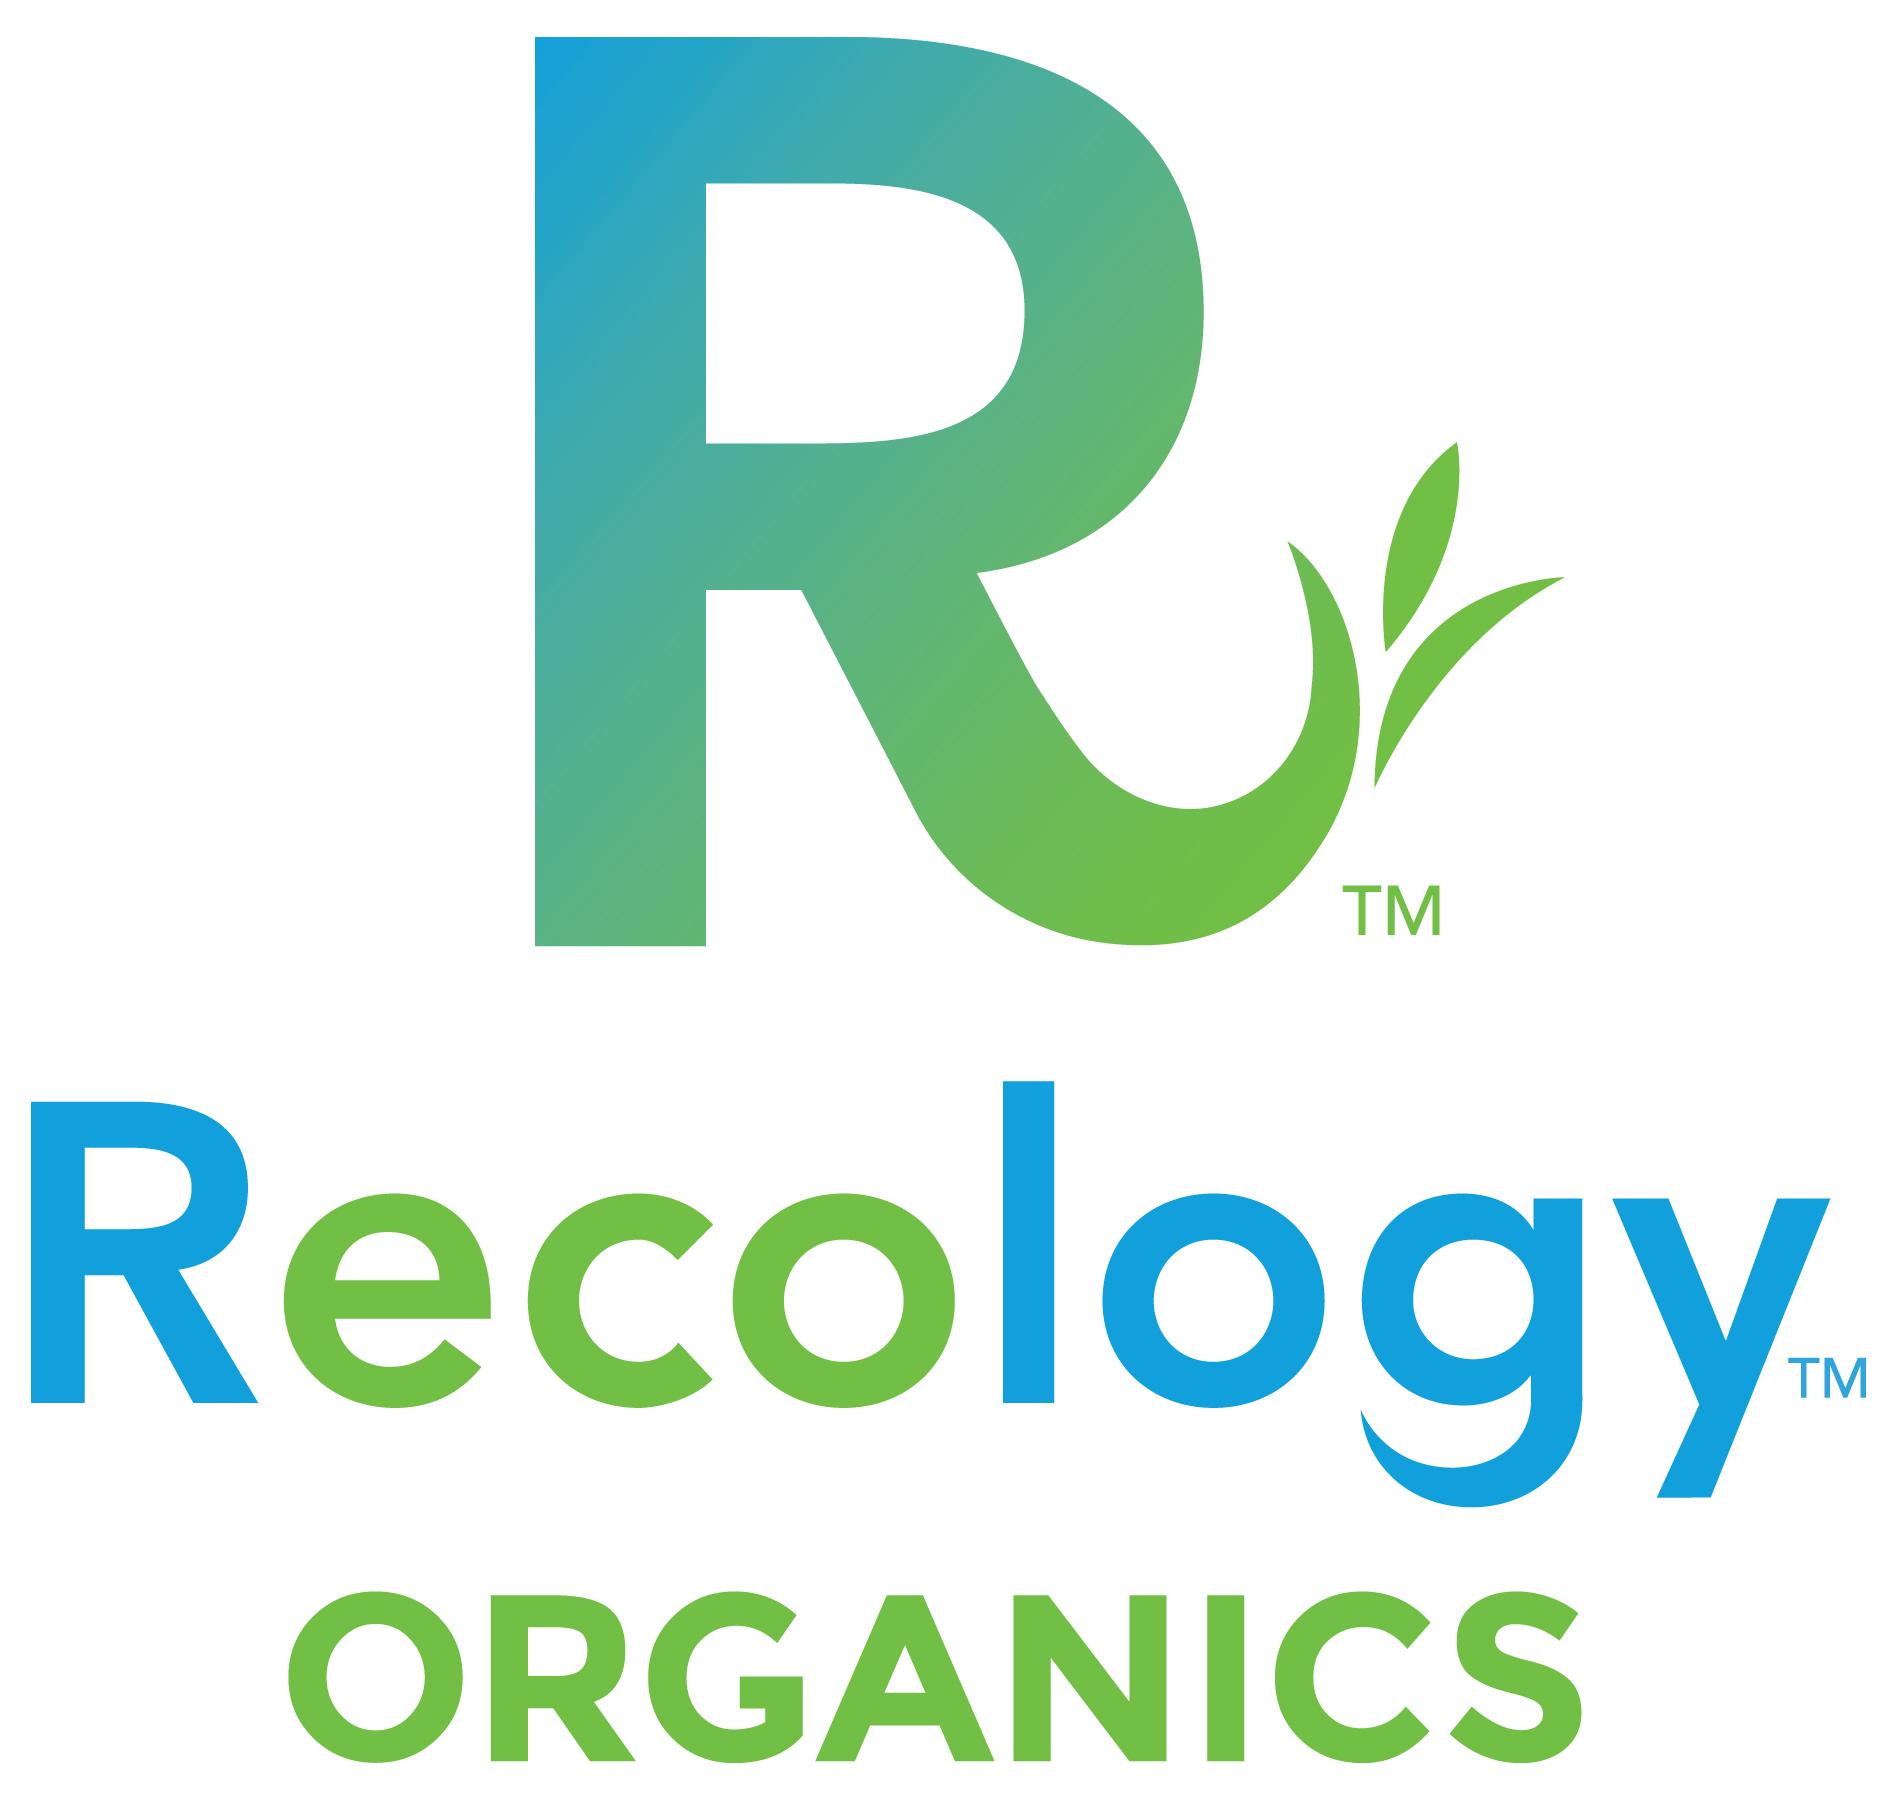 recology-logo-2018.jpg